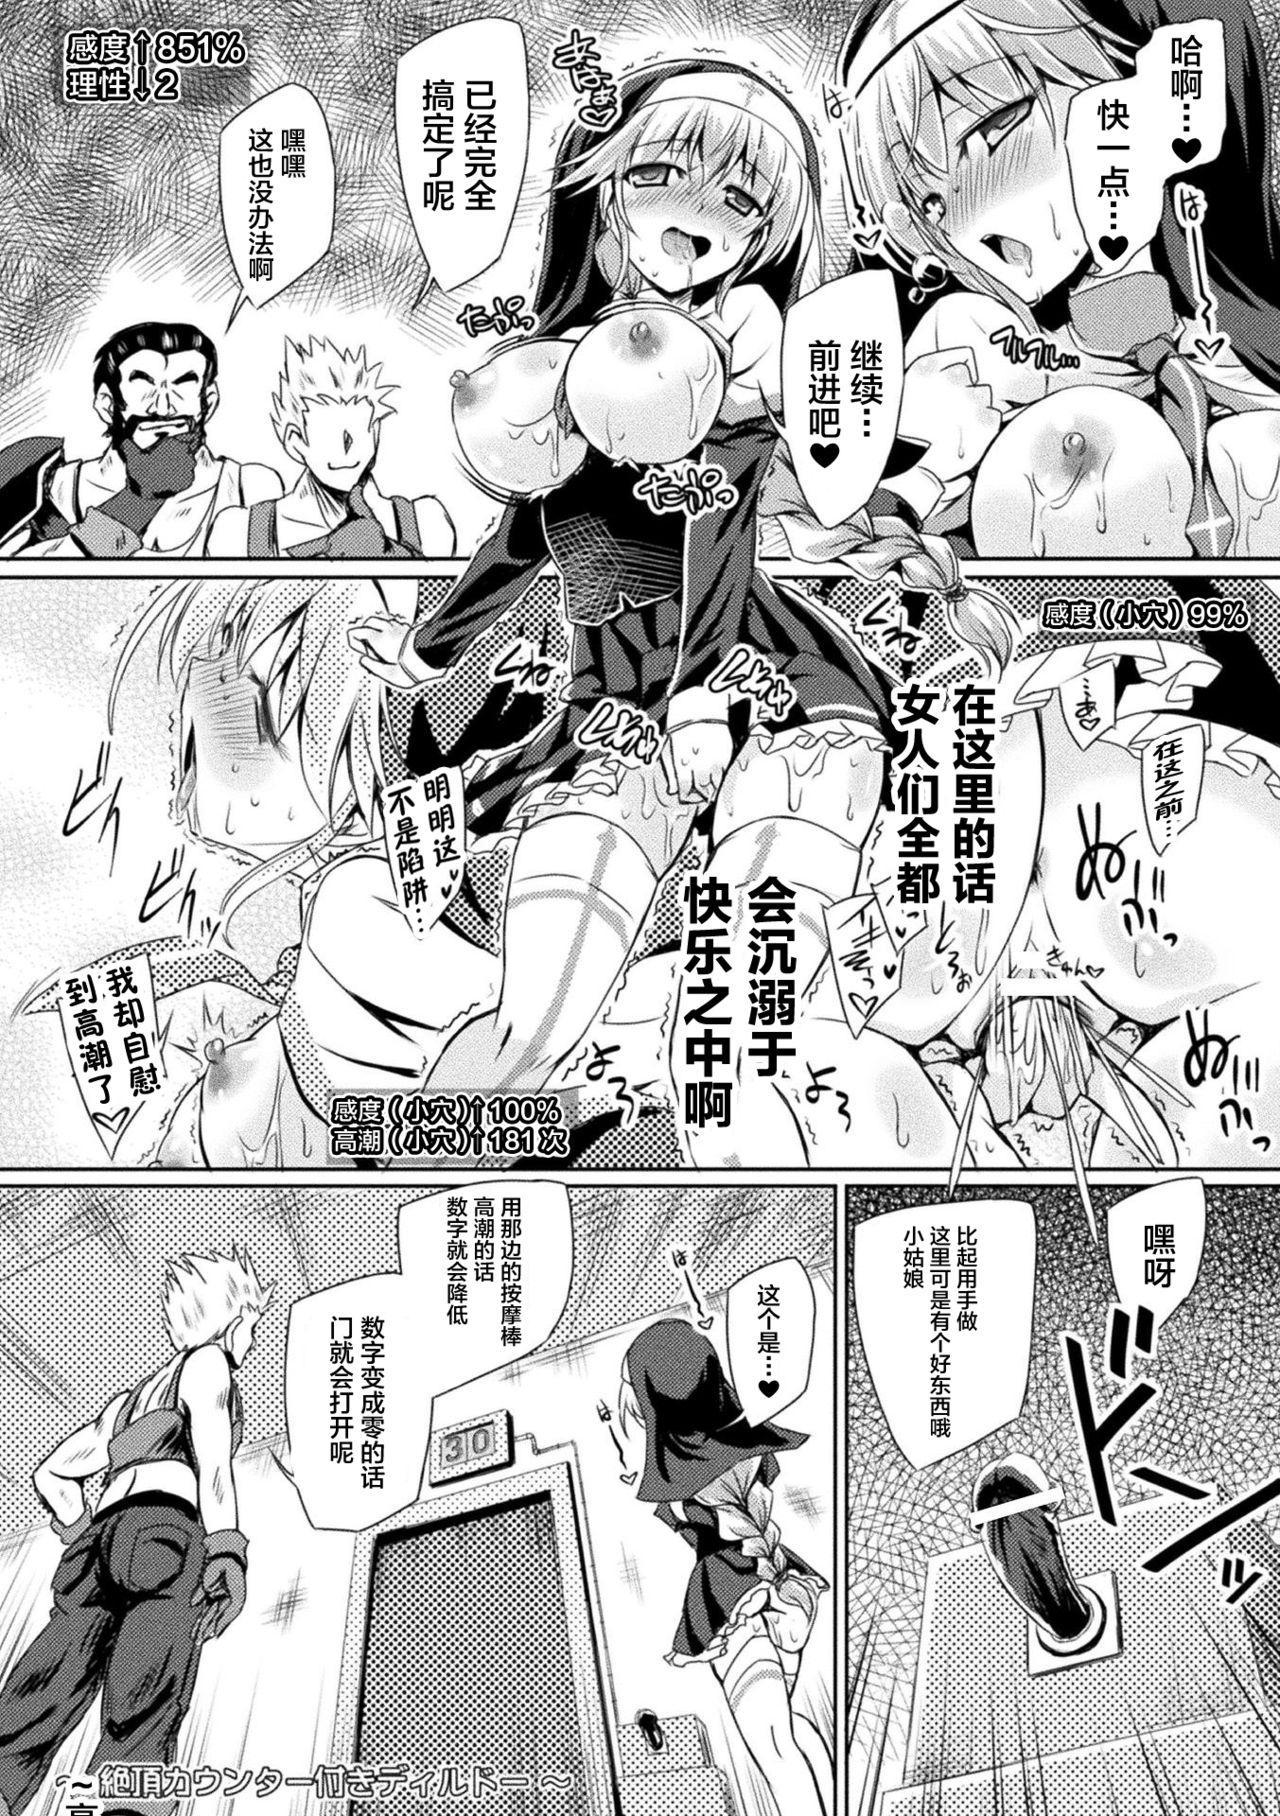 2D Comic Magazine Zecchou Kairaku ga Tomaranai Ero-Trap Dungeon Vol. 1 33